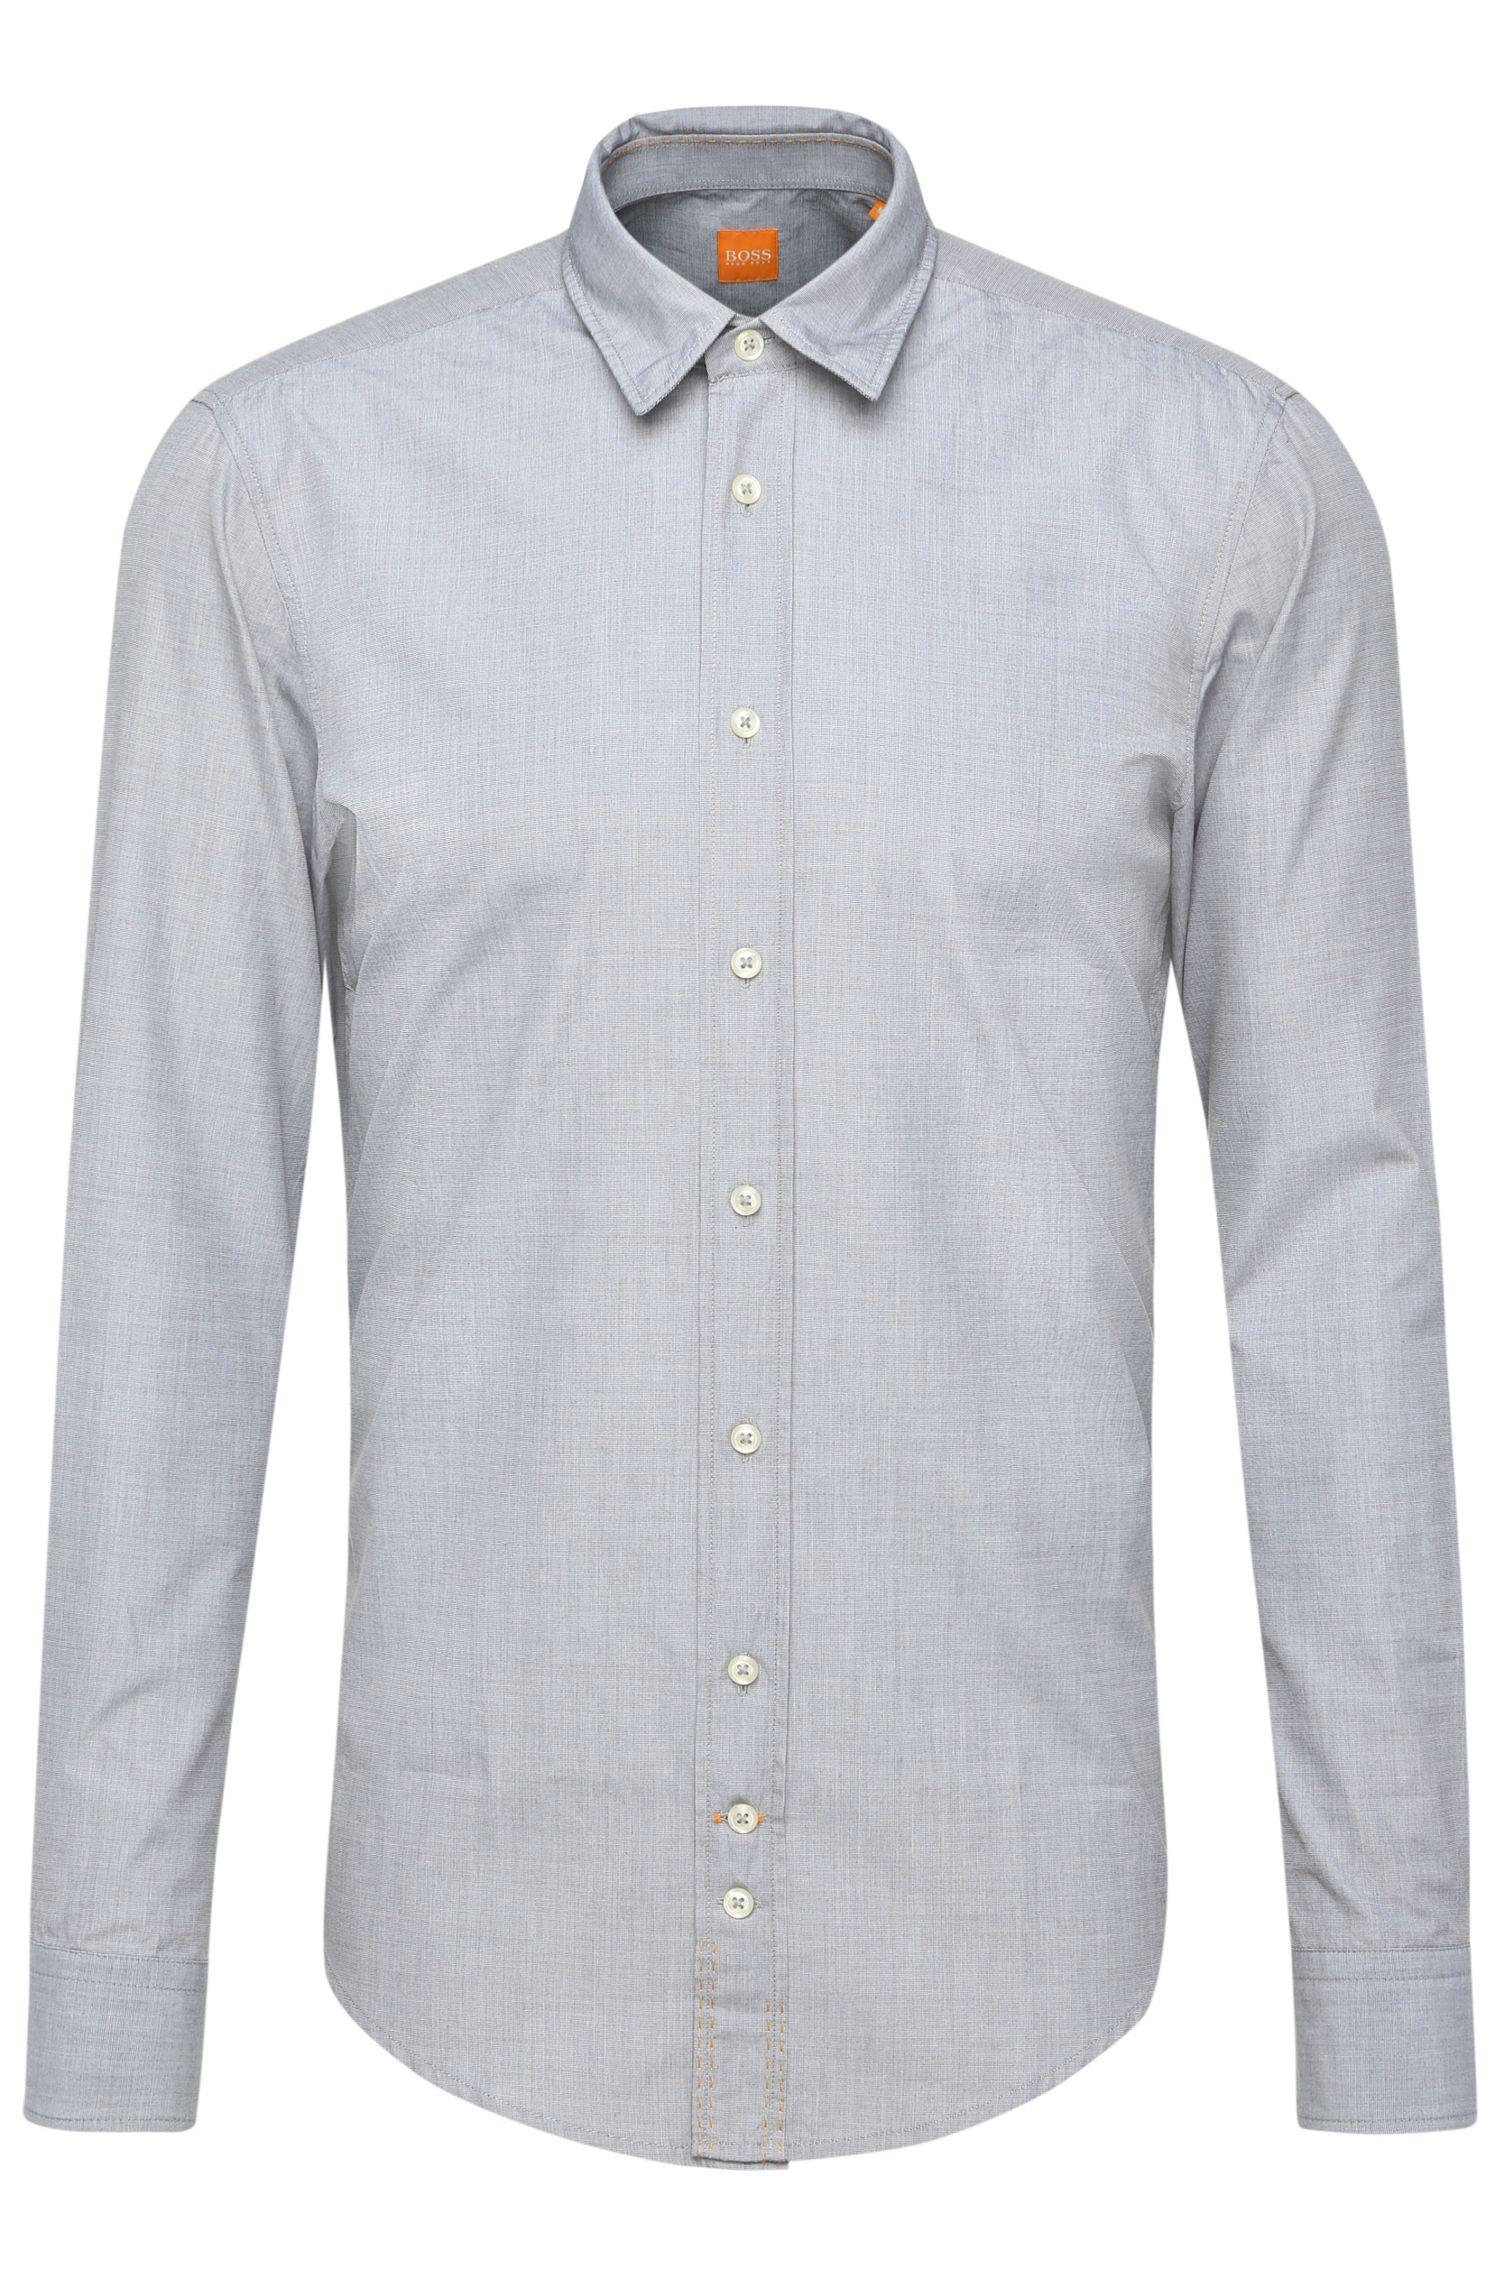 Camisa regular fit de algodón lavado